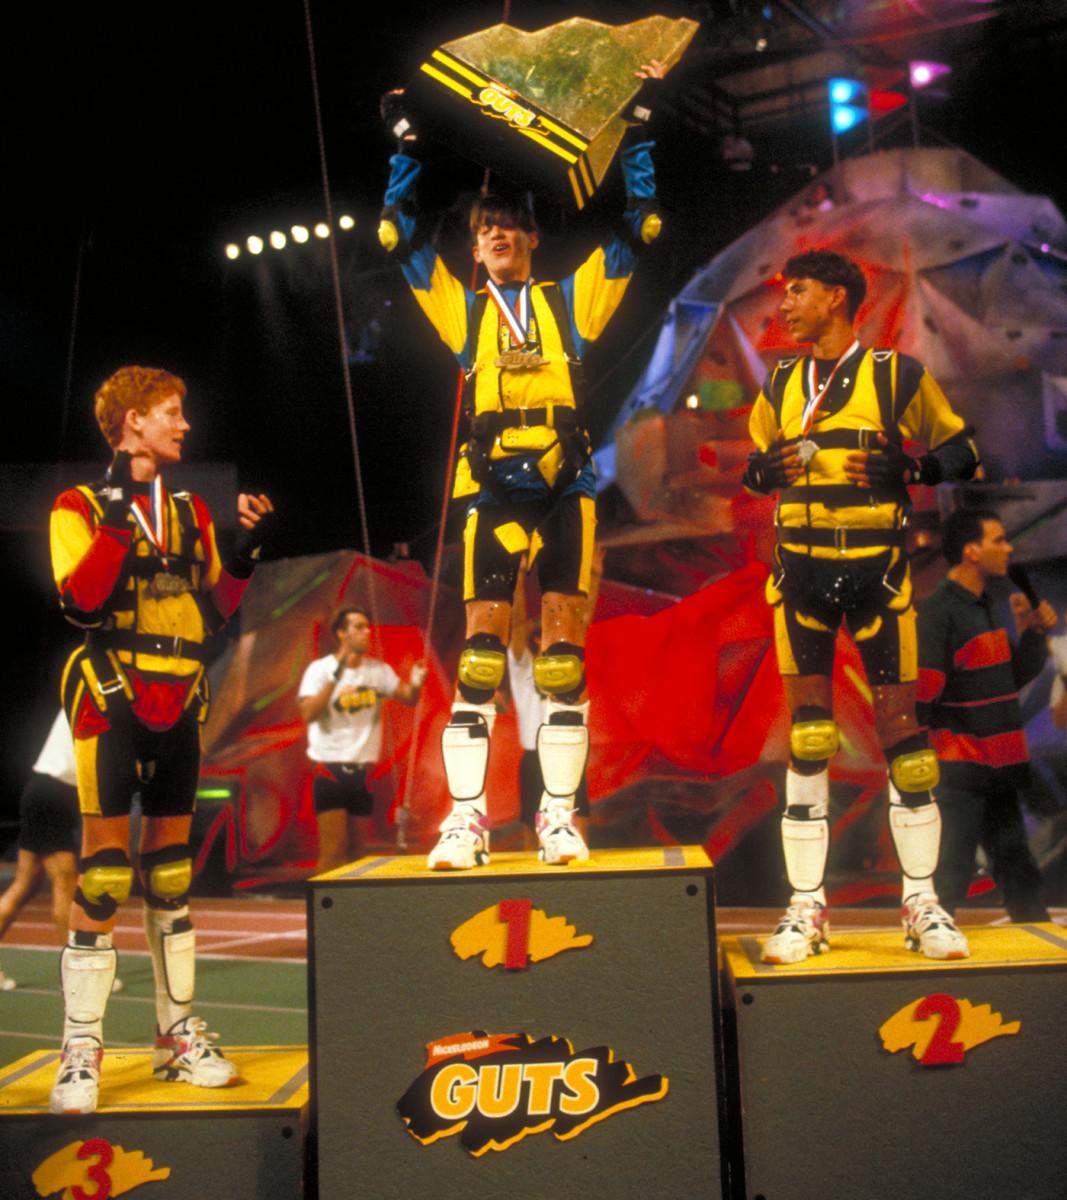 guts-podium-crag-trophy.jpg